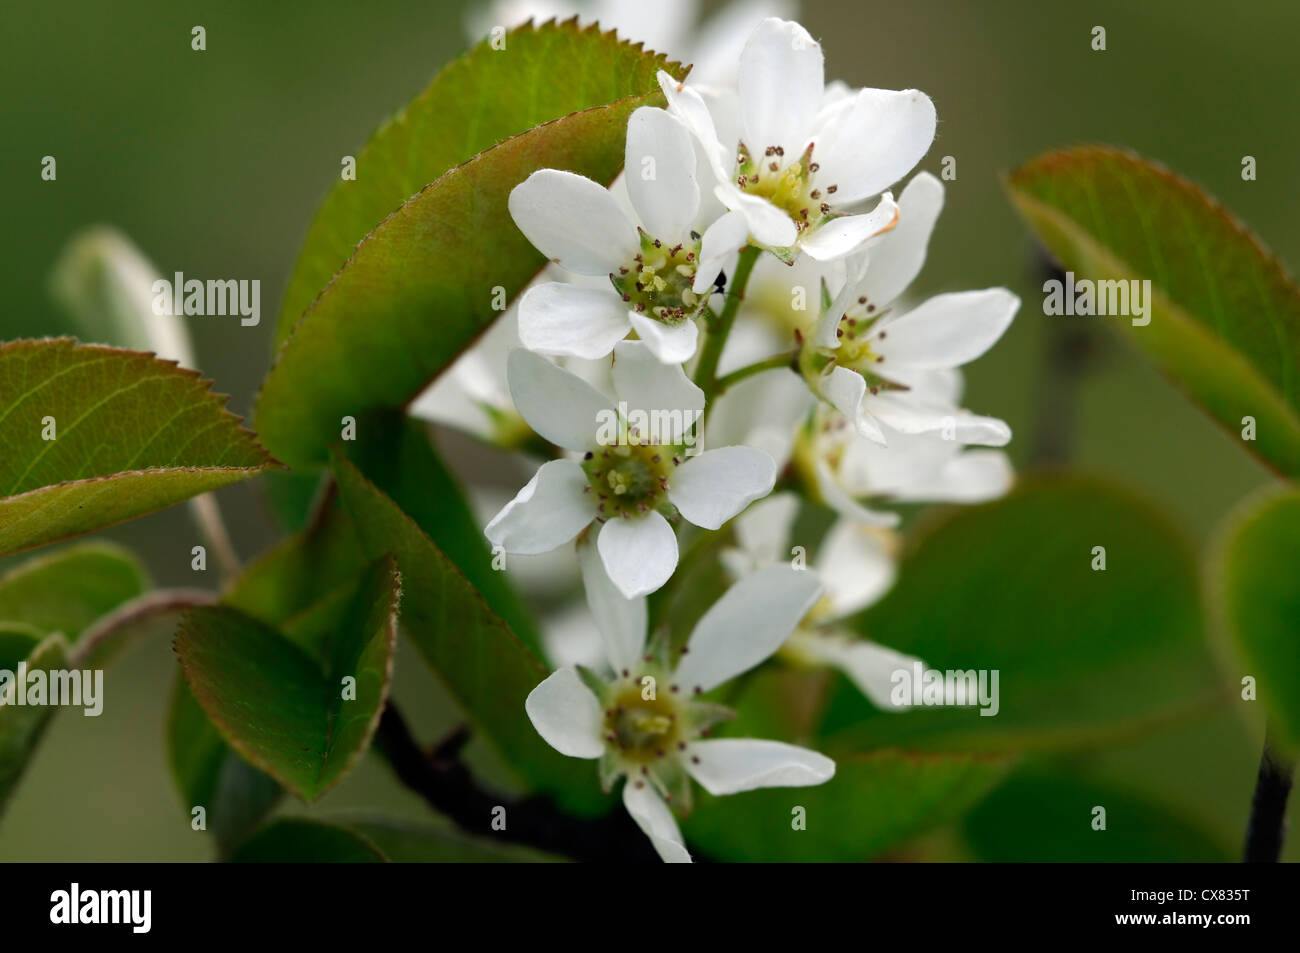 Amelanchier spicata white flowers flowering spring bloom blooming amelanchier spicata white flowers flowering spring bloom blooming blossom garden tree mightylinksfo